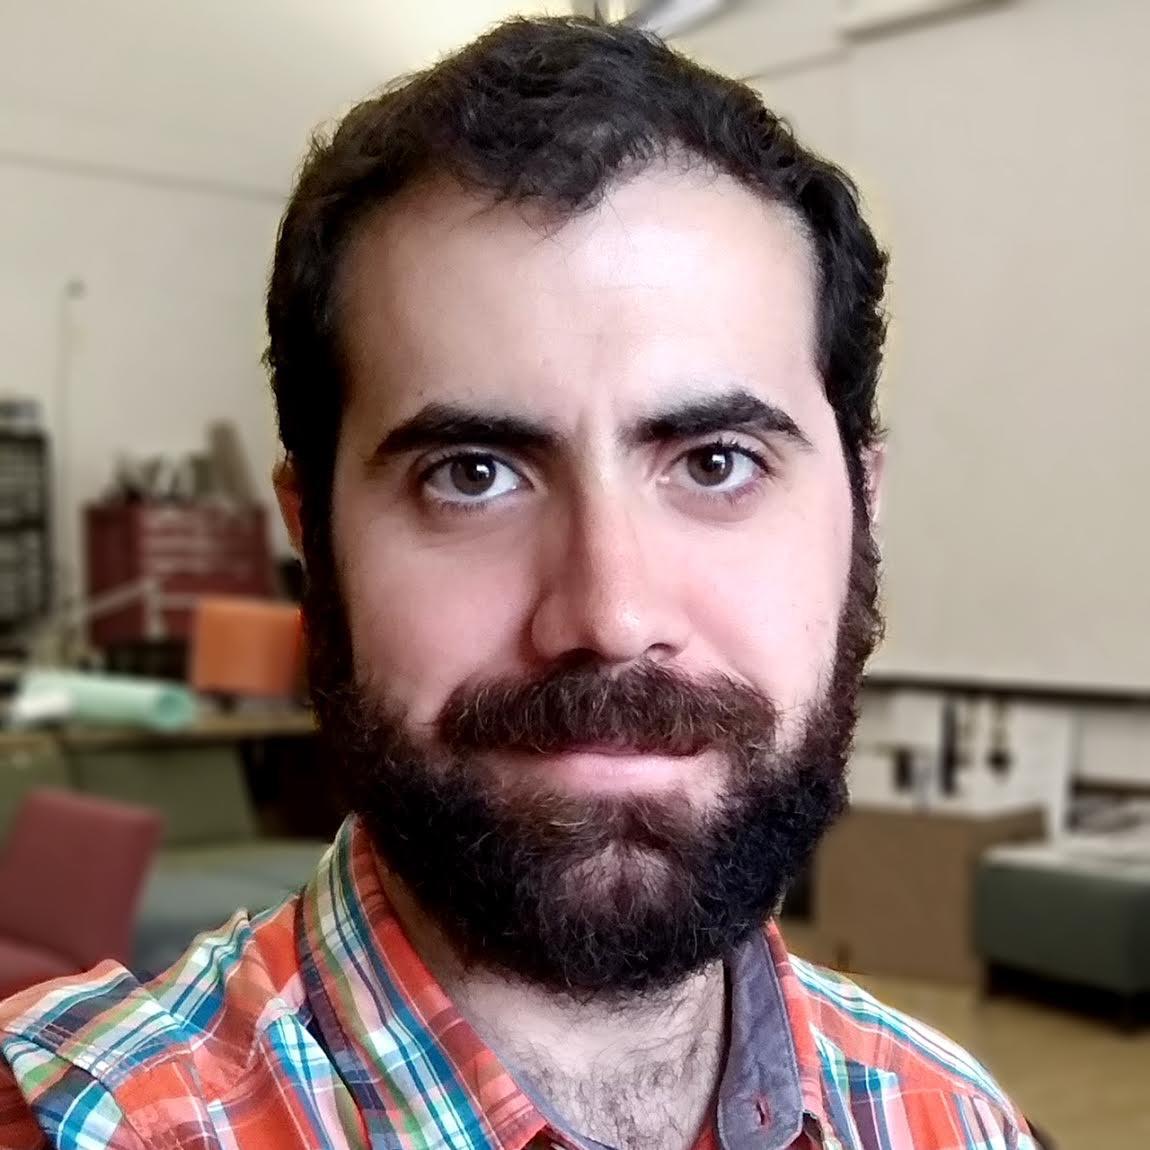 Javier Argota Sánchez-Vaquerizo